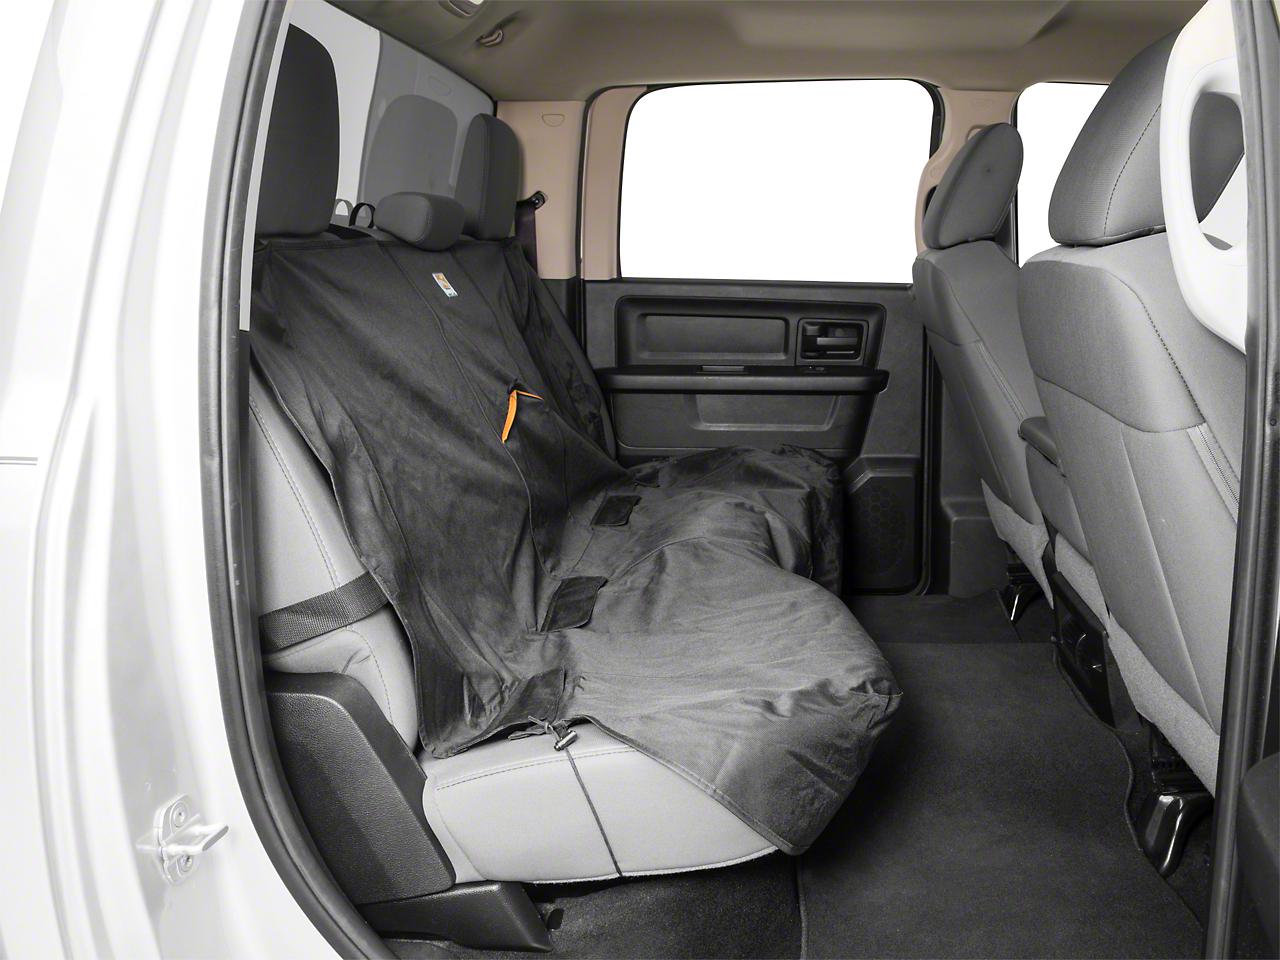 Kurgo Wander Rear Bench Seat Cover - Black (02-19 RAM 1500 Quad Cab, Crew Cab, Mega Cab)